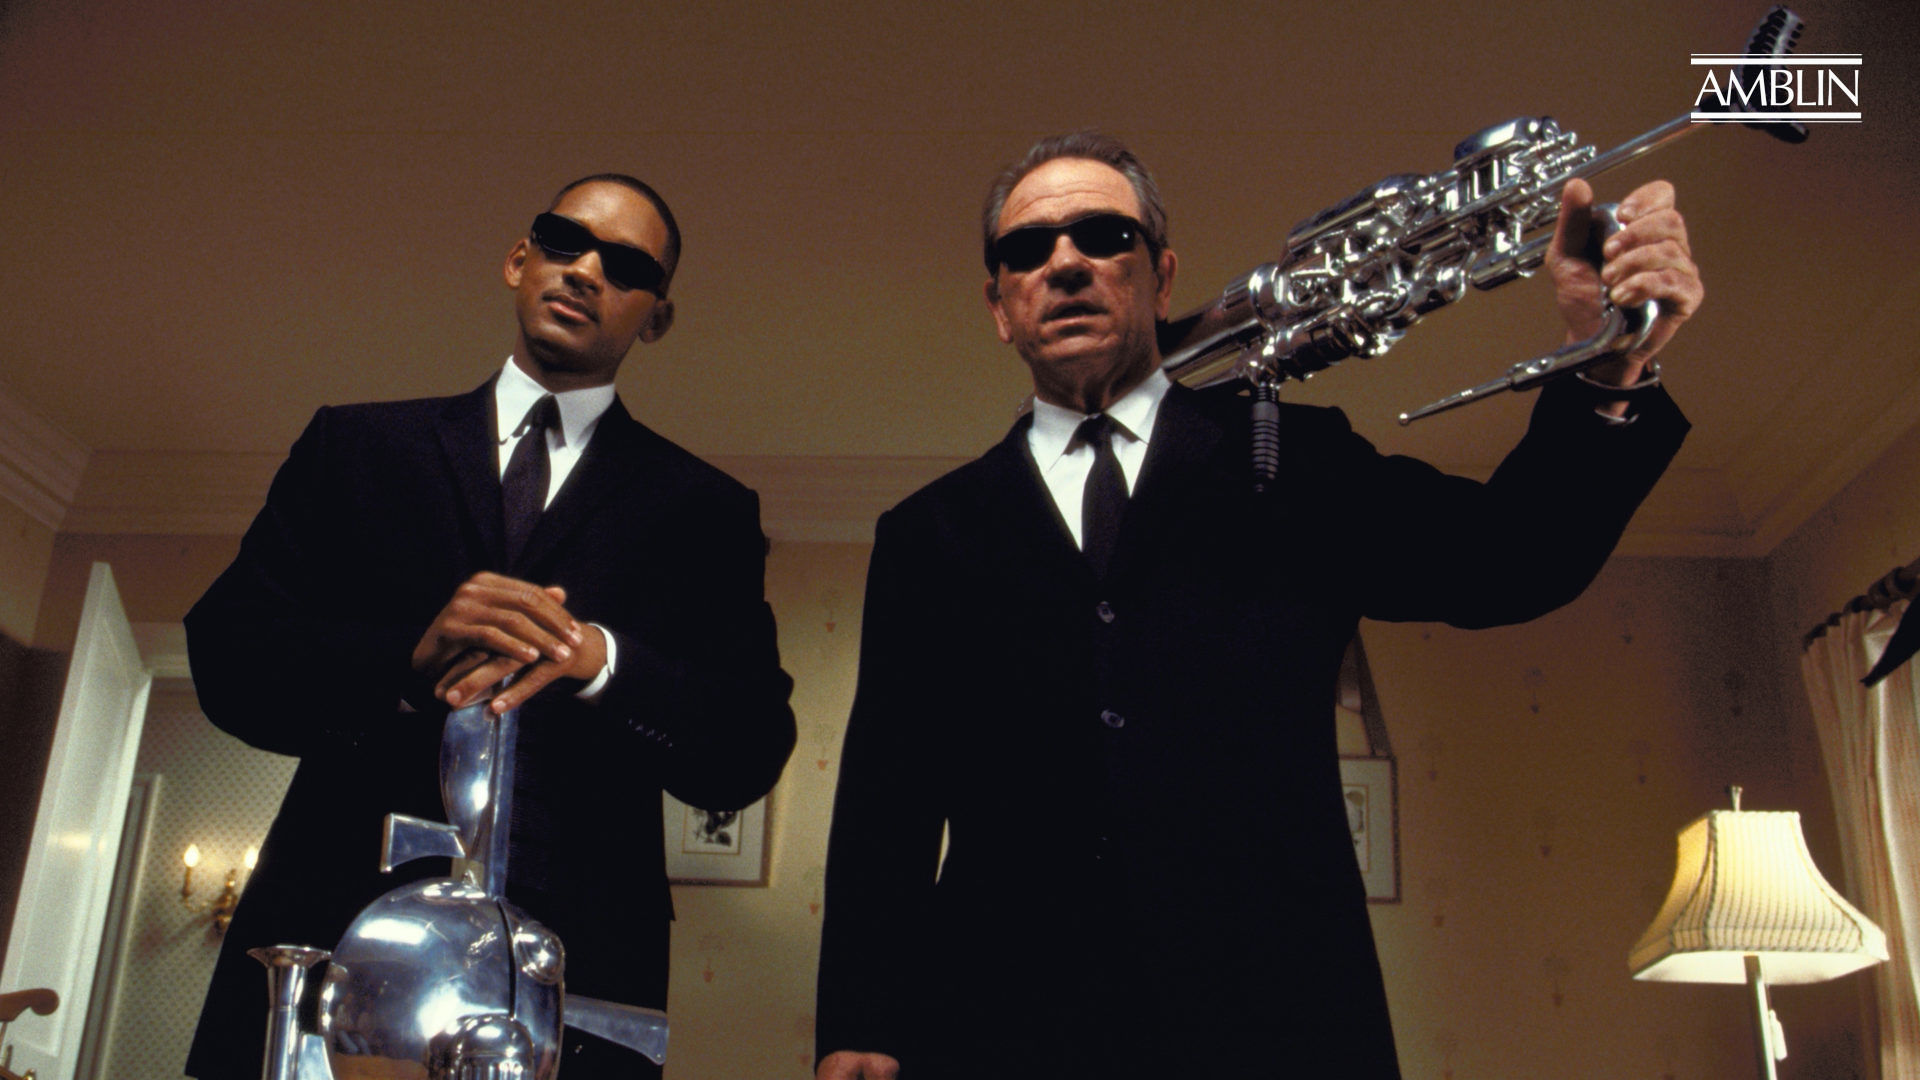 Men In Black Ii 2002 About The Movie Amblin